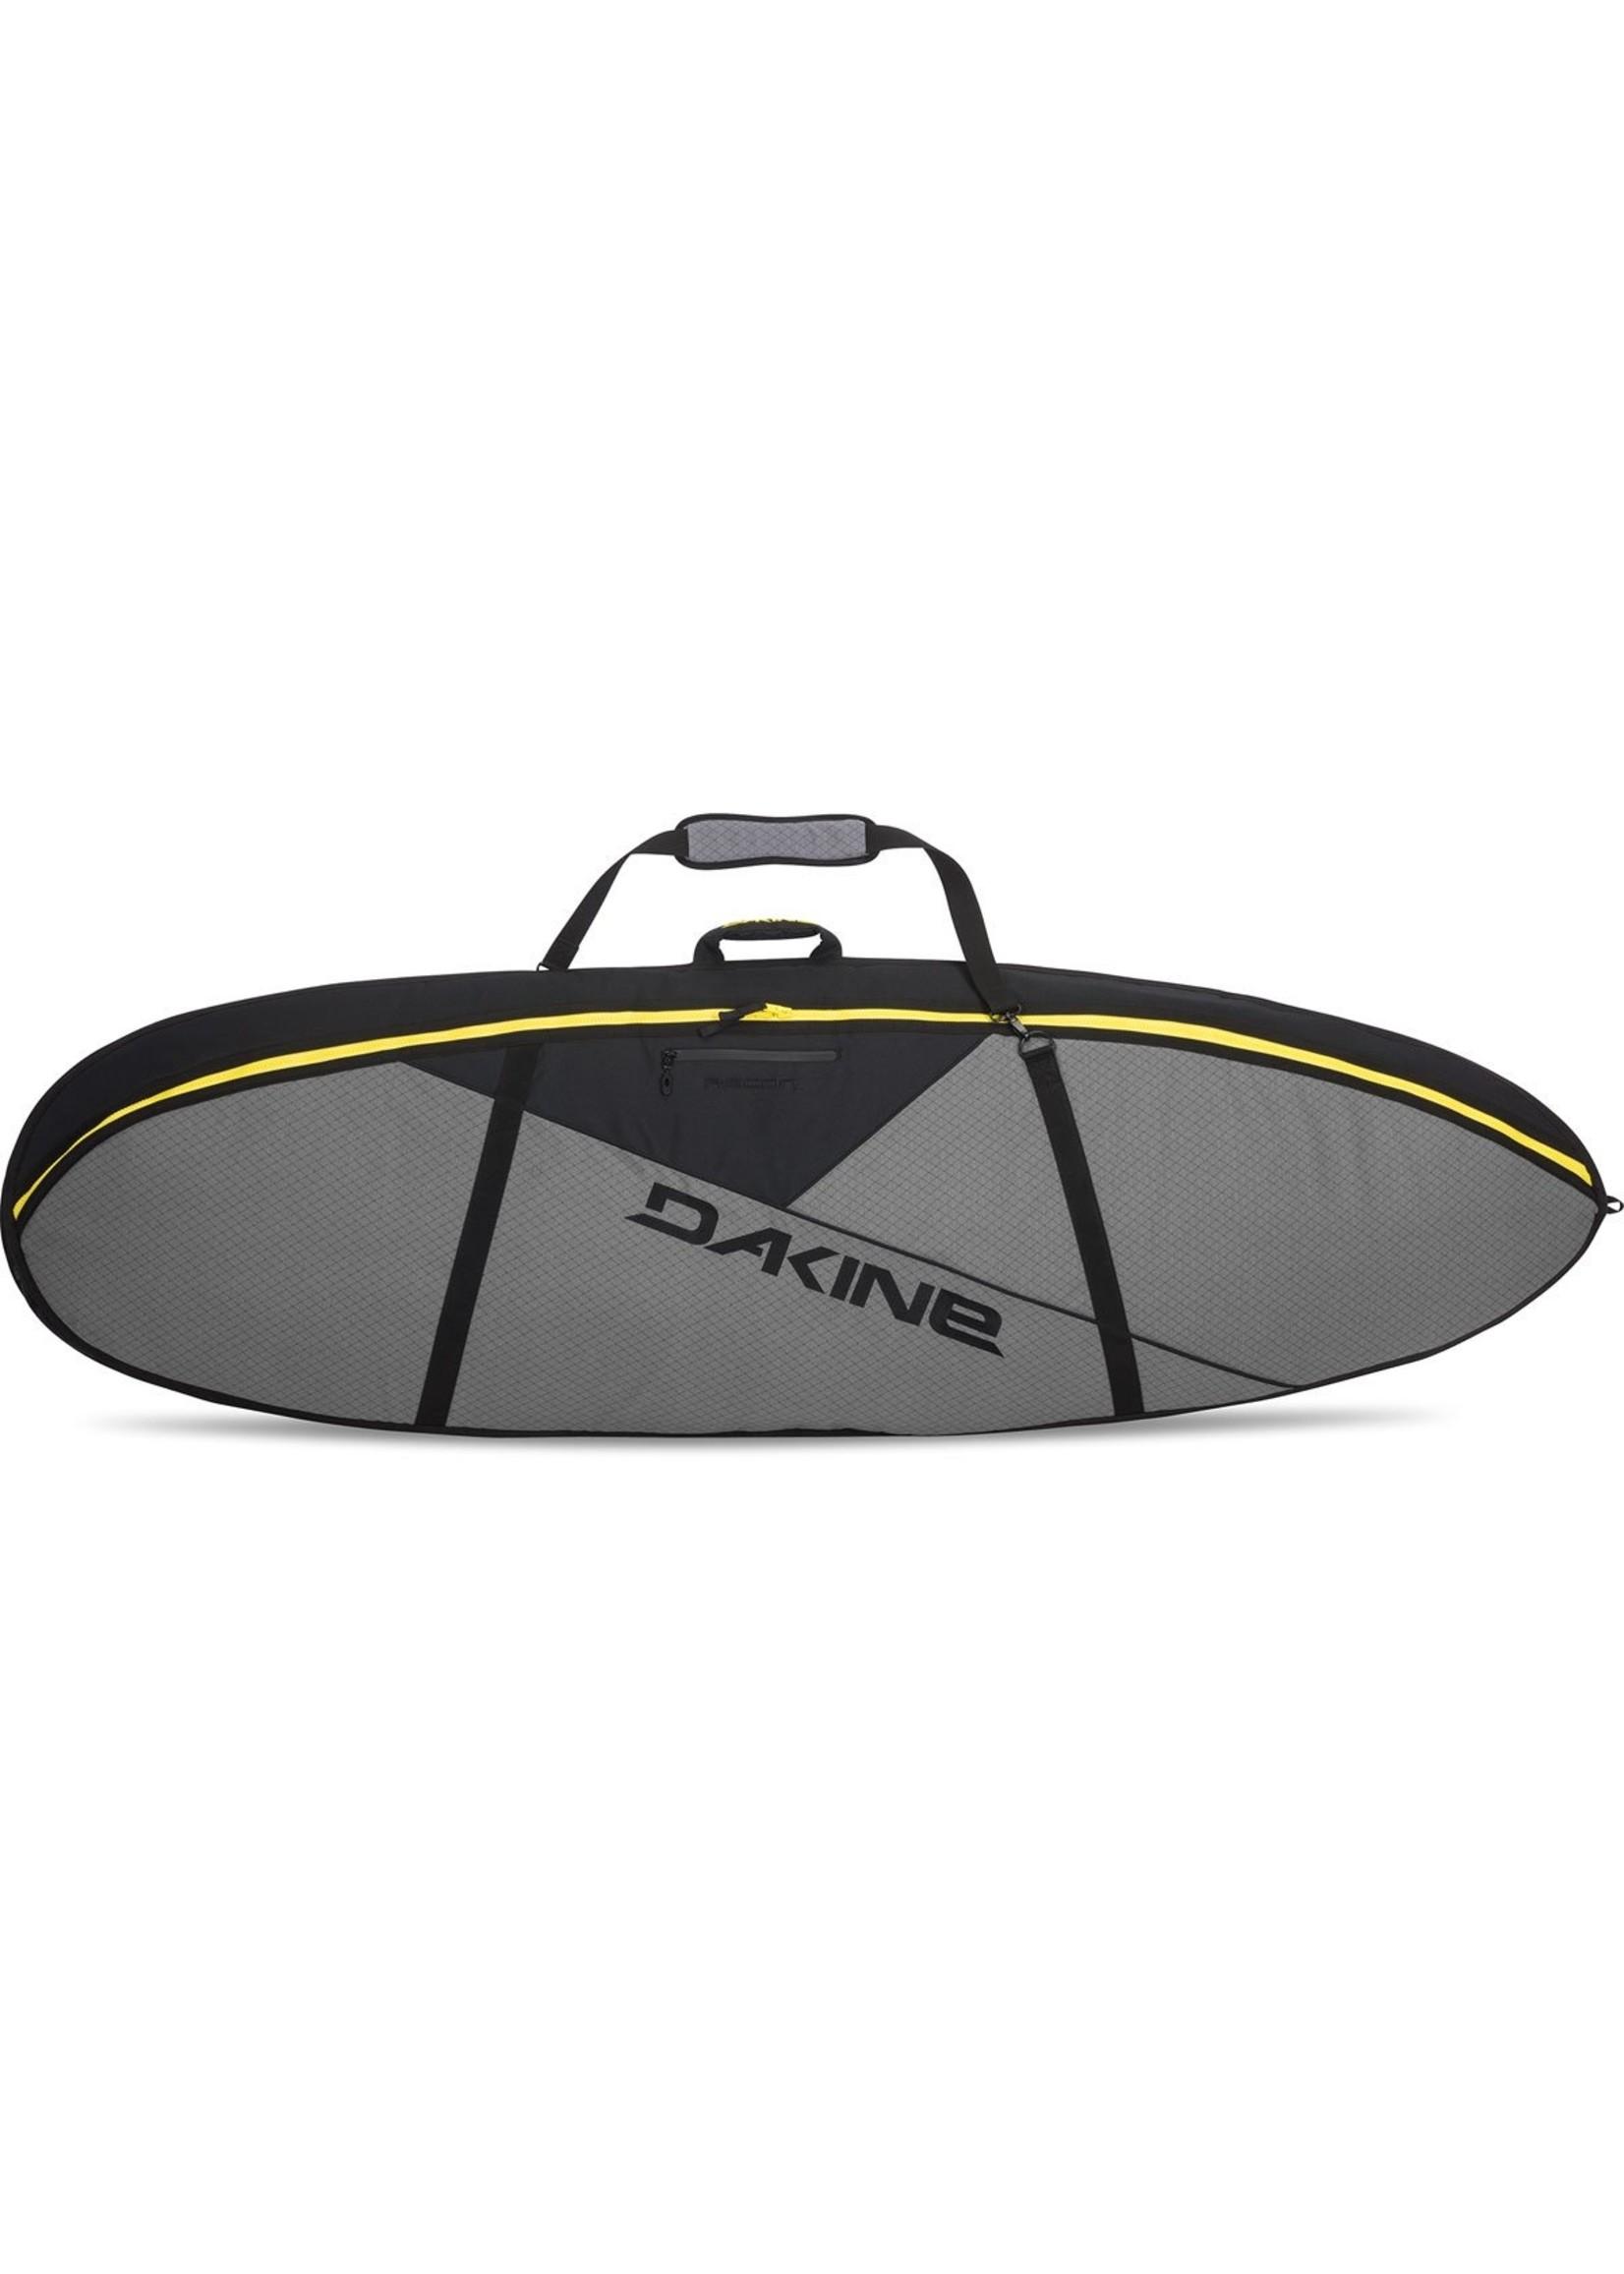 Dakine RECON DOUBLE SURFBOARD BAG - THRUSTER 7'6''